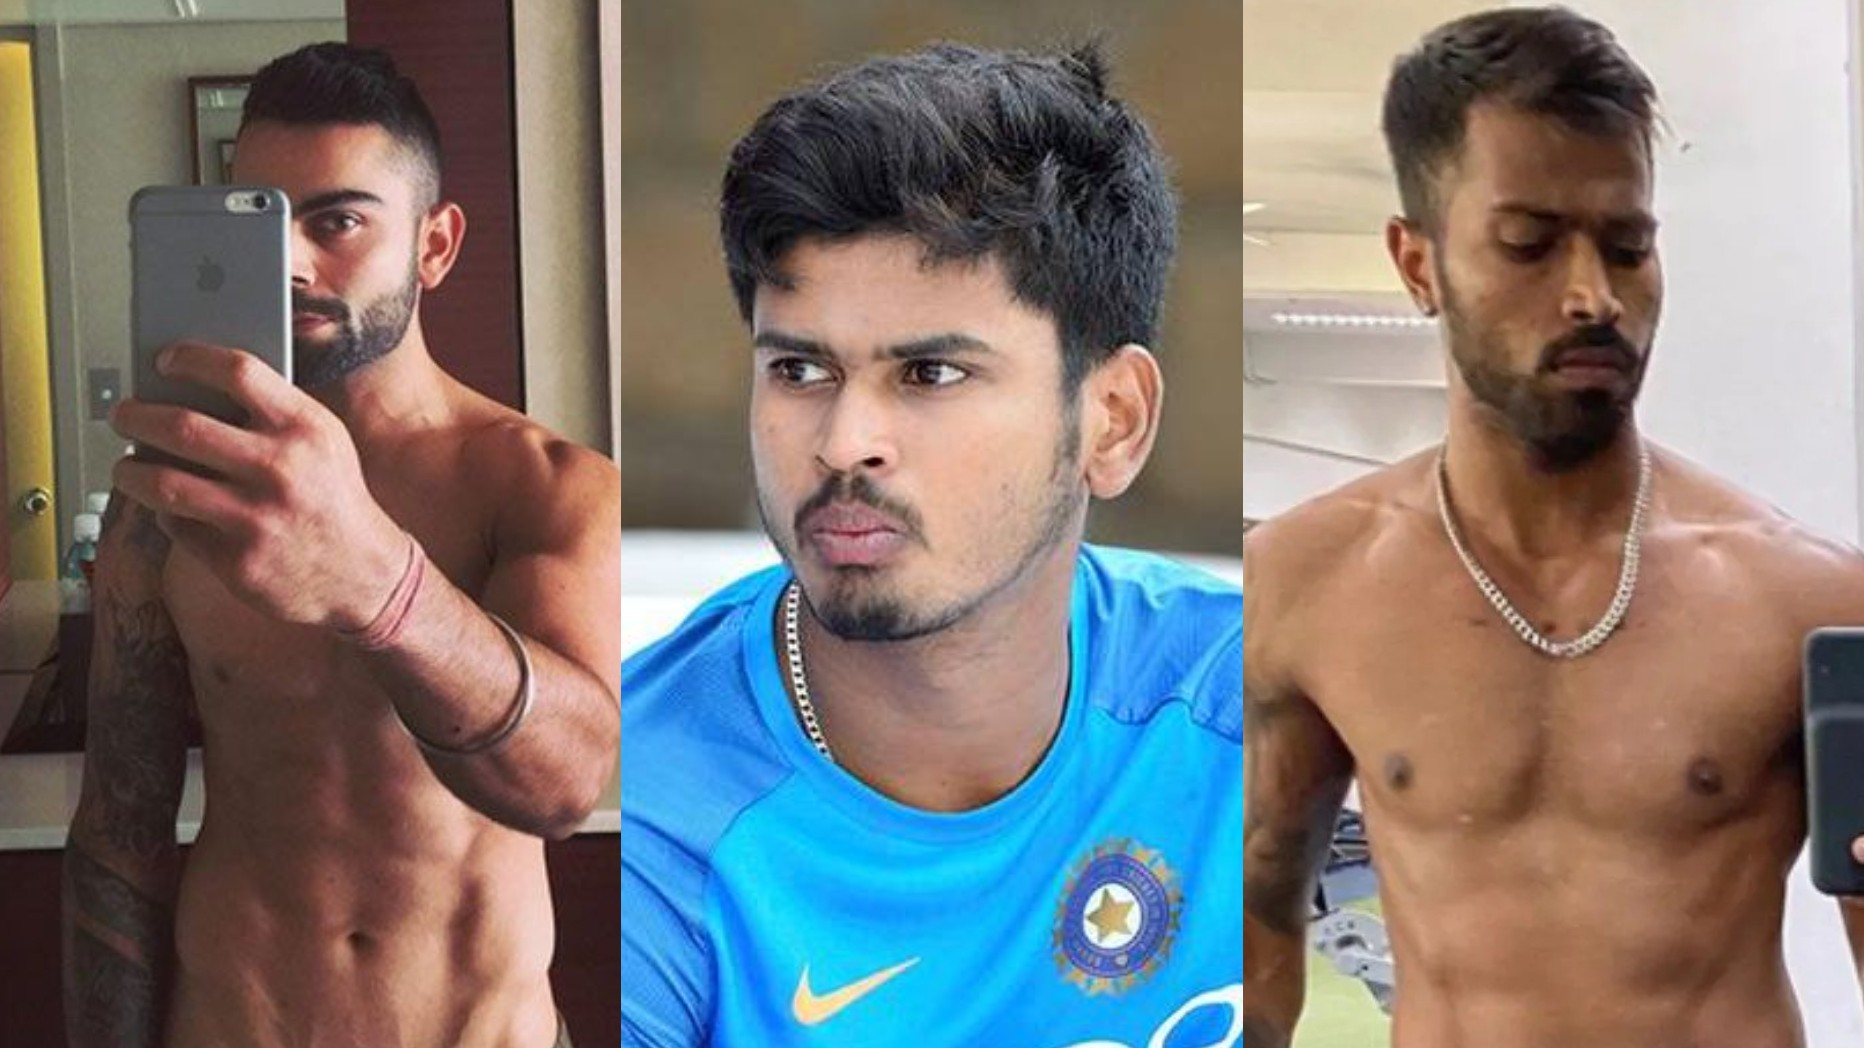 WATCH- Shreyas Iyer picks the winner of an arm-wrestling match between Virat Kohli and Hardik Pandya